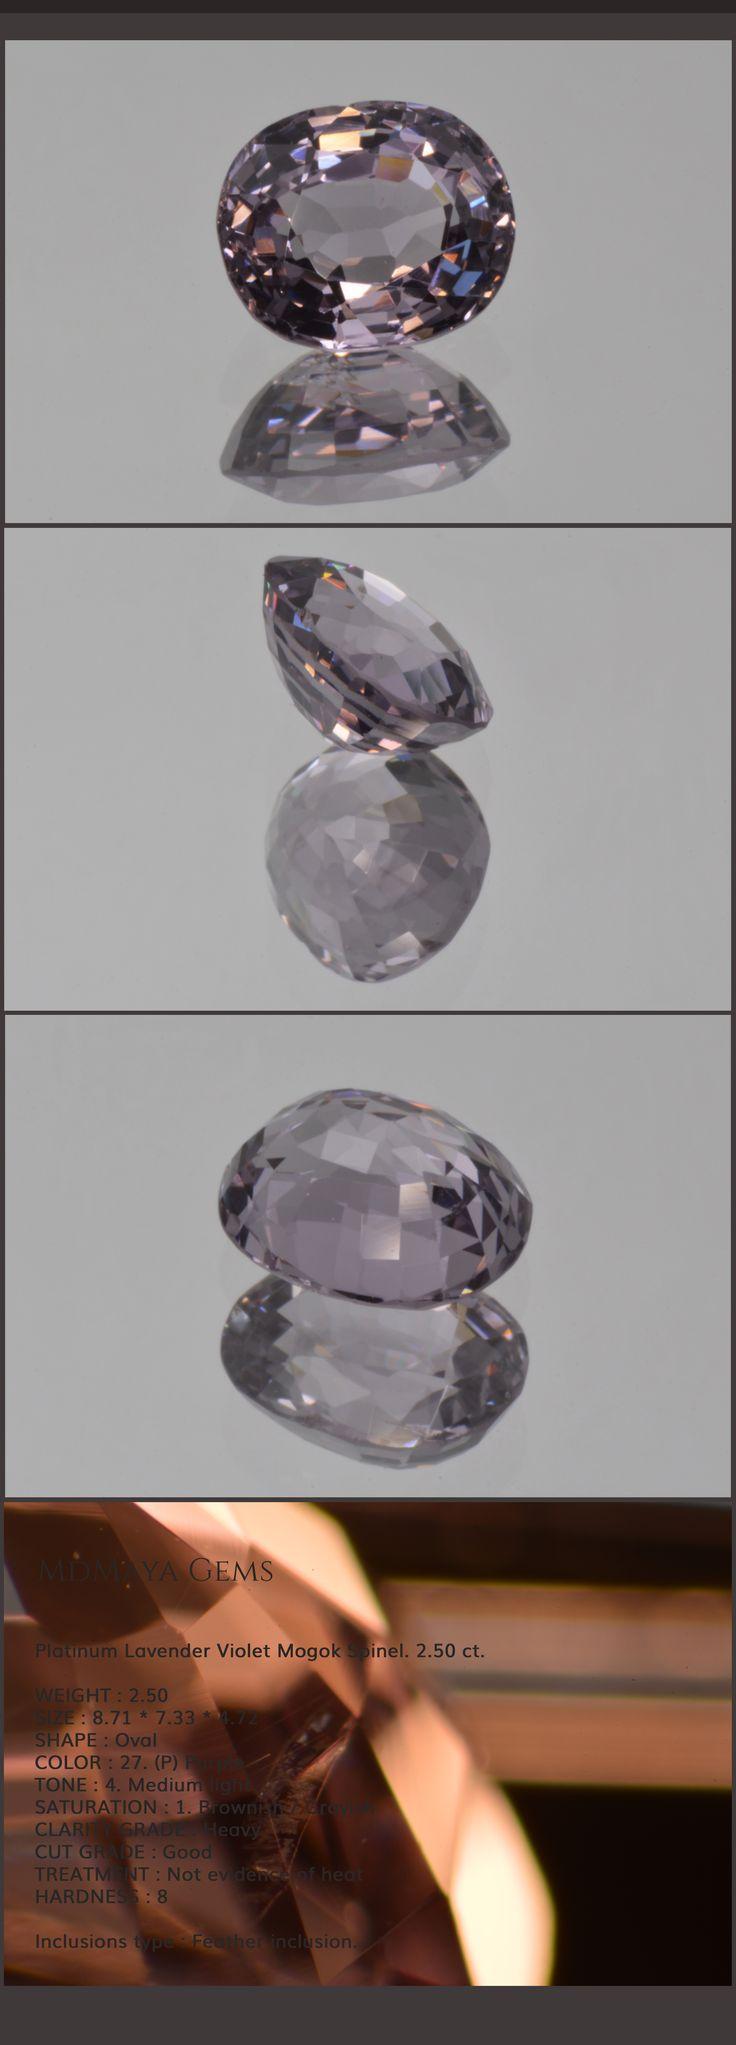 Platinum Lavender Violet Mogok Spinel. 2.50 ct. WEIGHT : 2.50 SIZE : 8.71 * 7.33 * 4.72 SHAPE : Oval COLOR : 27. (P) Purple TONE : 4. Medium light SATURATION : 1. Brownish / Grayish CLARITY GRADE : He